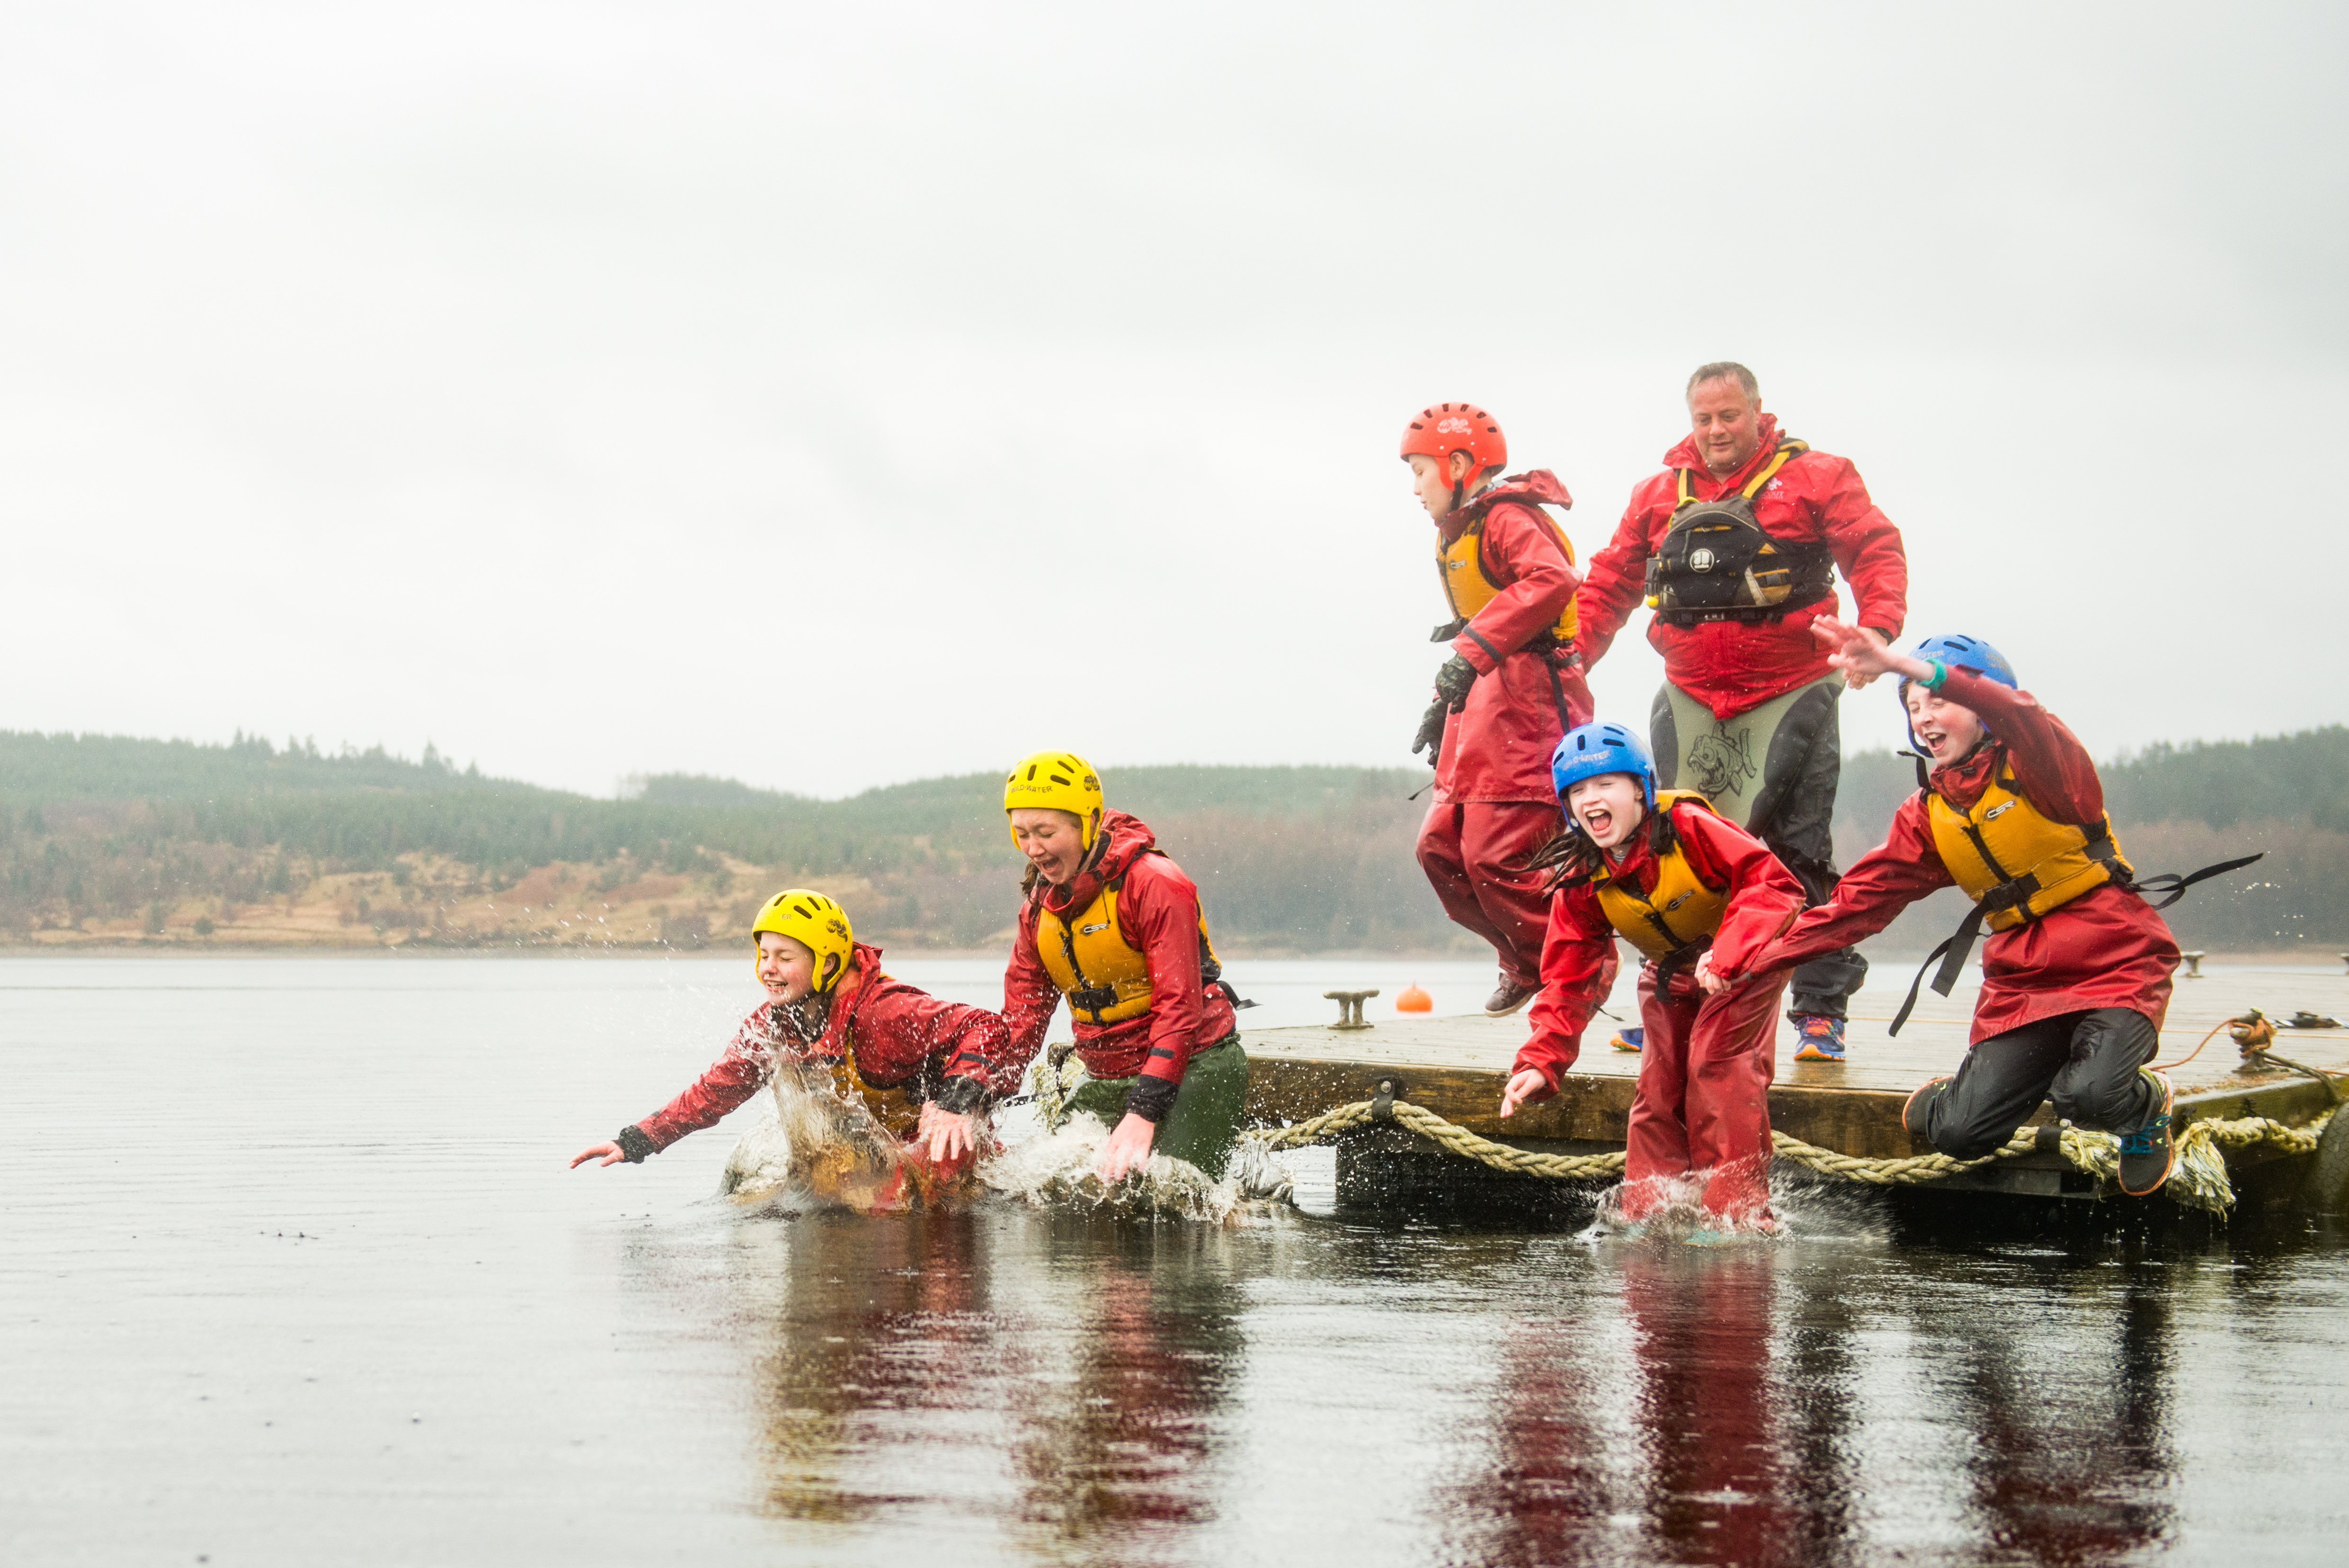 scouts-on-raft-jpg